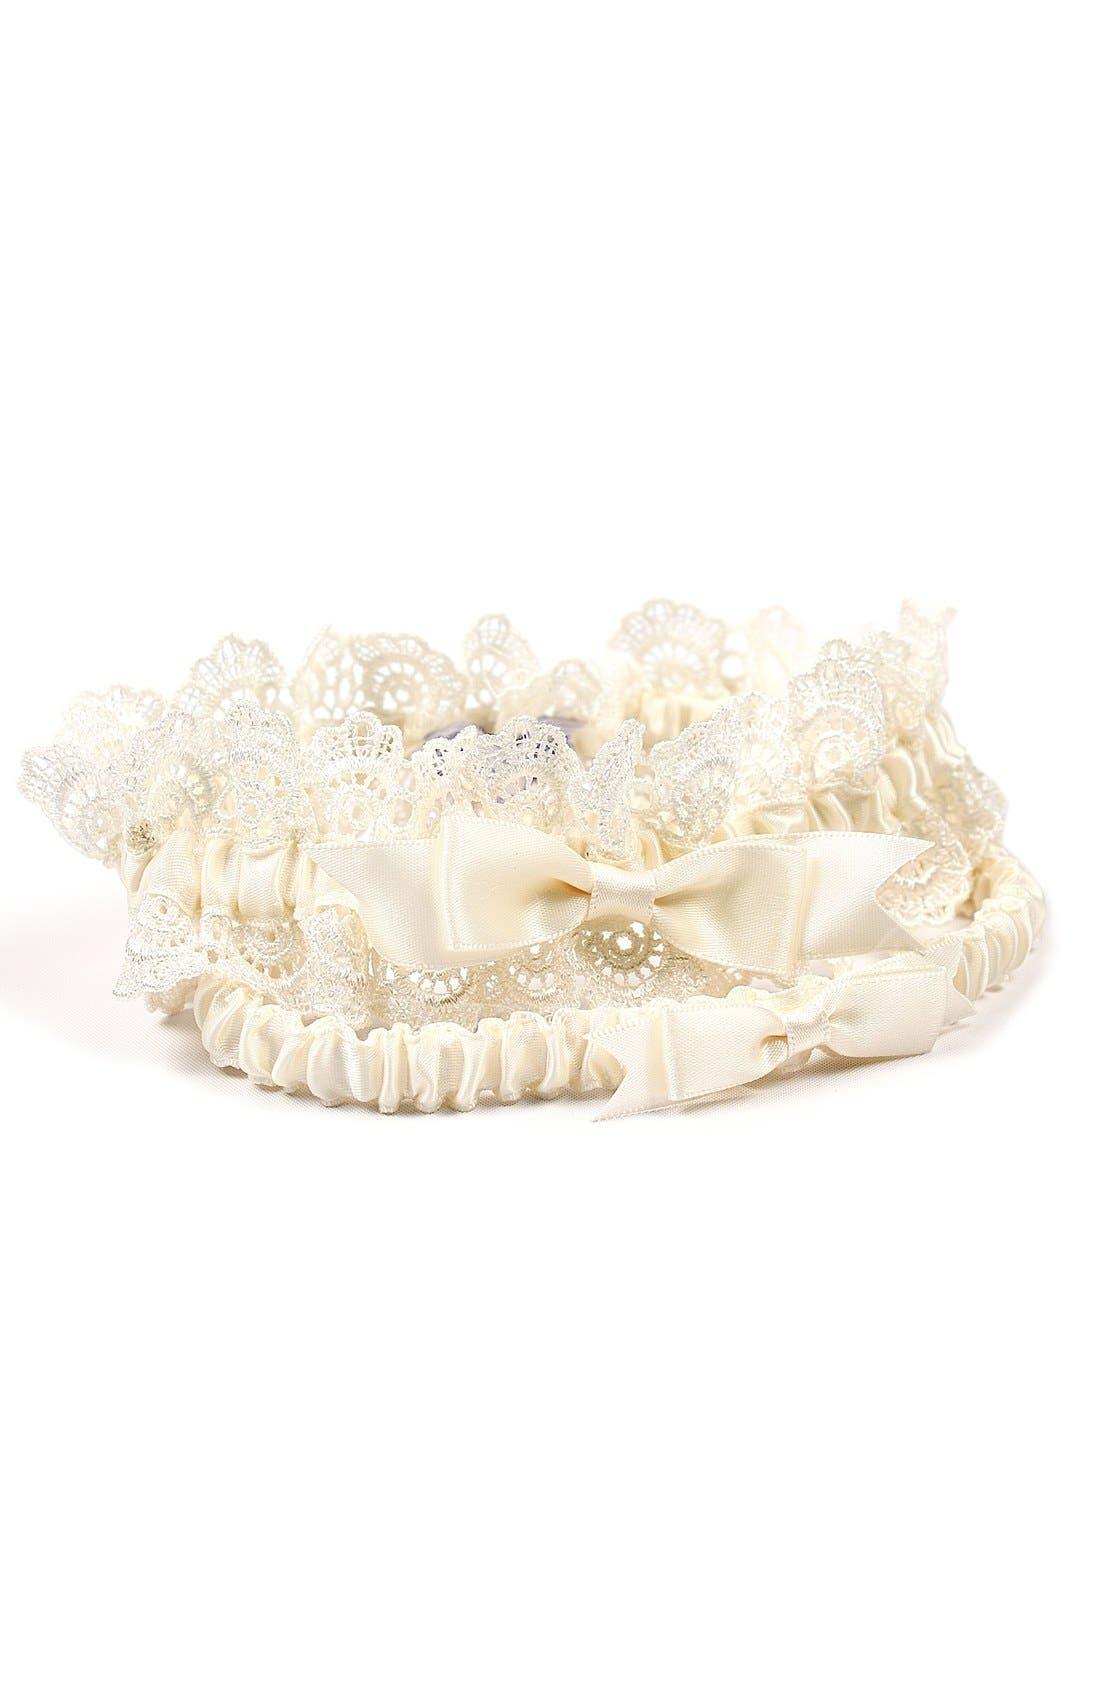 'Eleanor' Lace Wedding Garter,                             Main thumbnail 1, color,